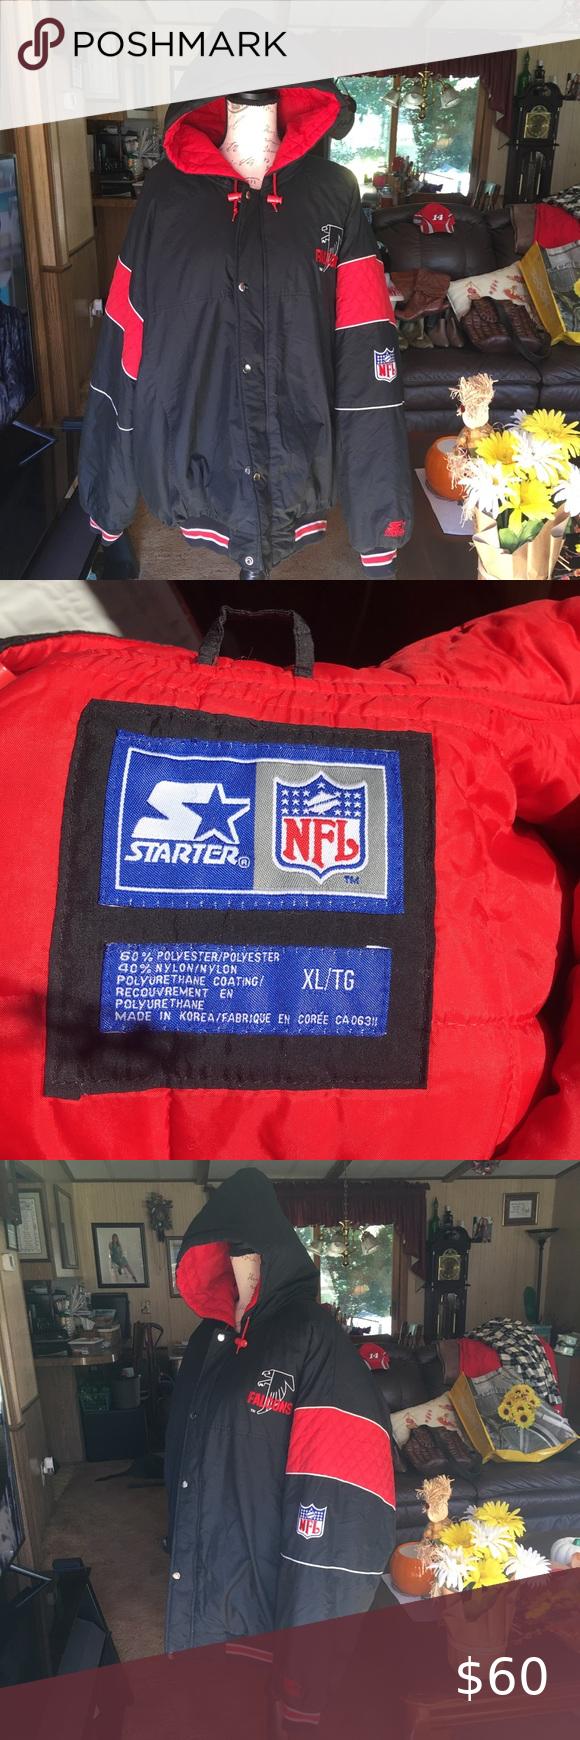 Men S Nfl Atlanta Falcons Big Puffy Jacket Puffy Jacket Big Puffy Clothes Design [ 1740 x 580 Pixel ]